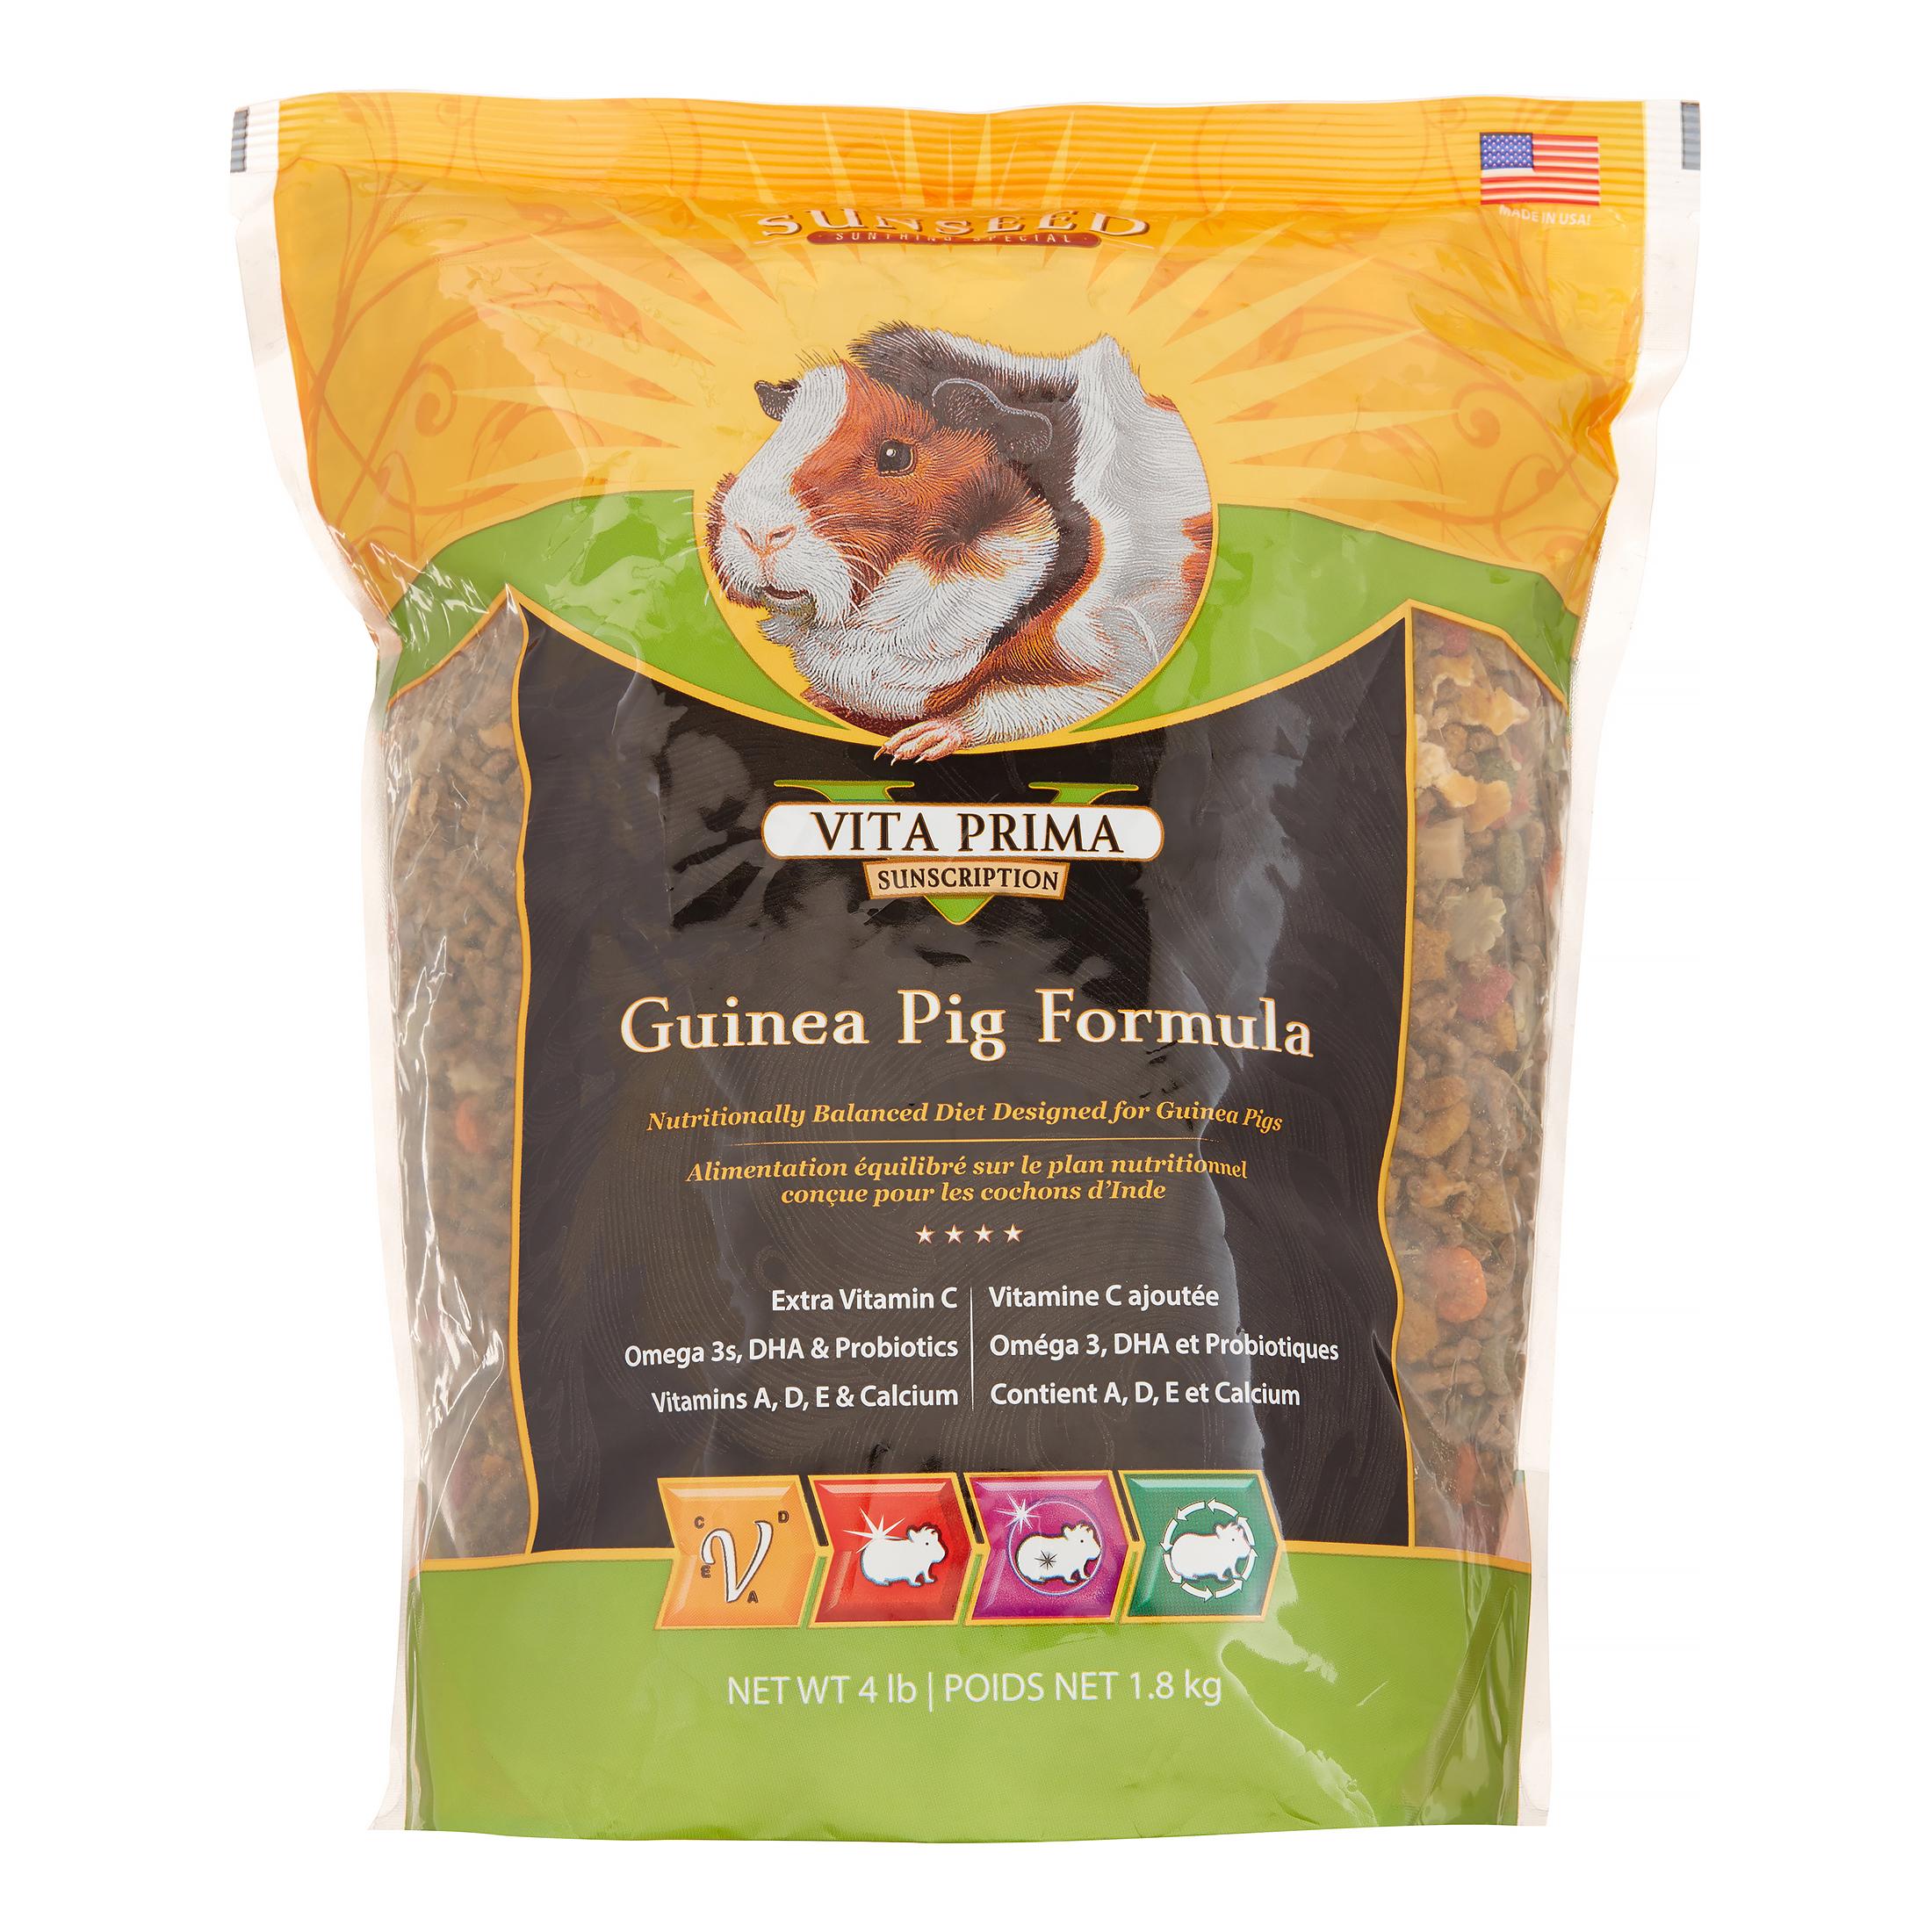 Sunseed Vita Prima Guinea Pig Formula Dry Guinea Pig Food, 4 Lb